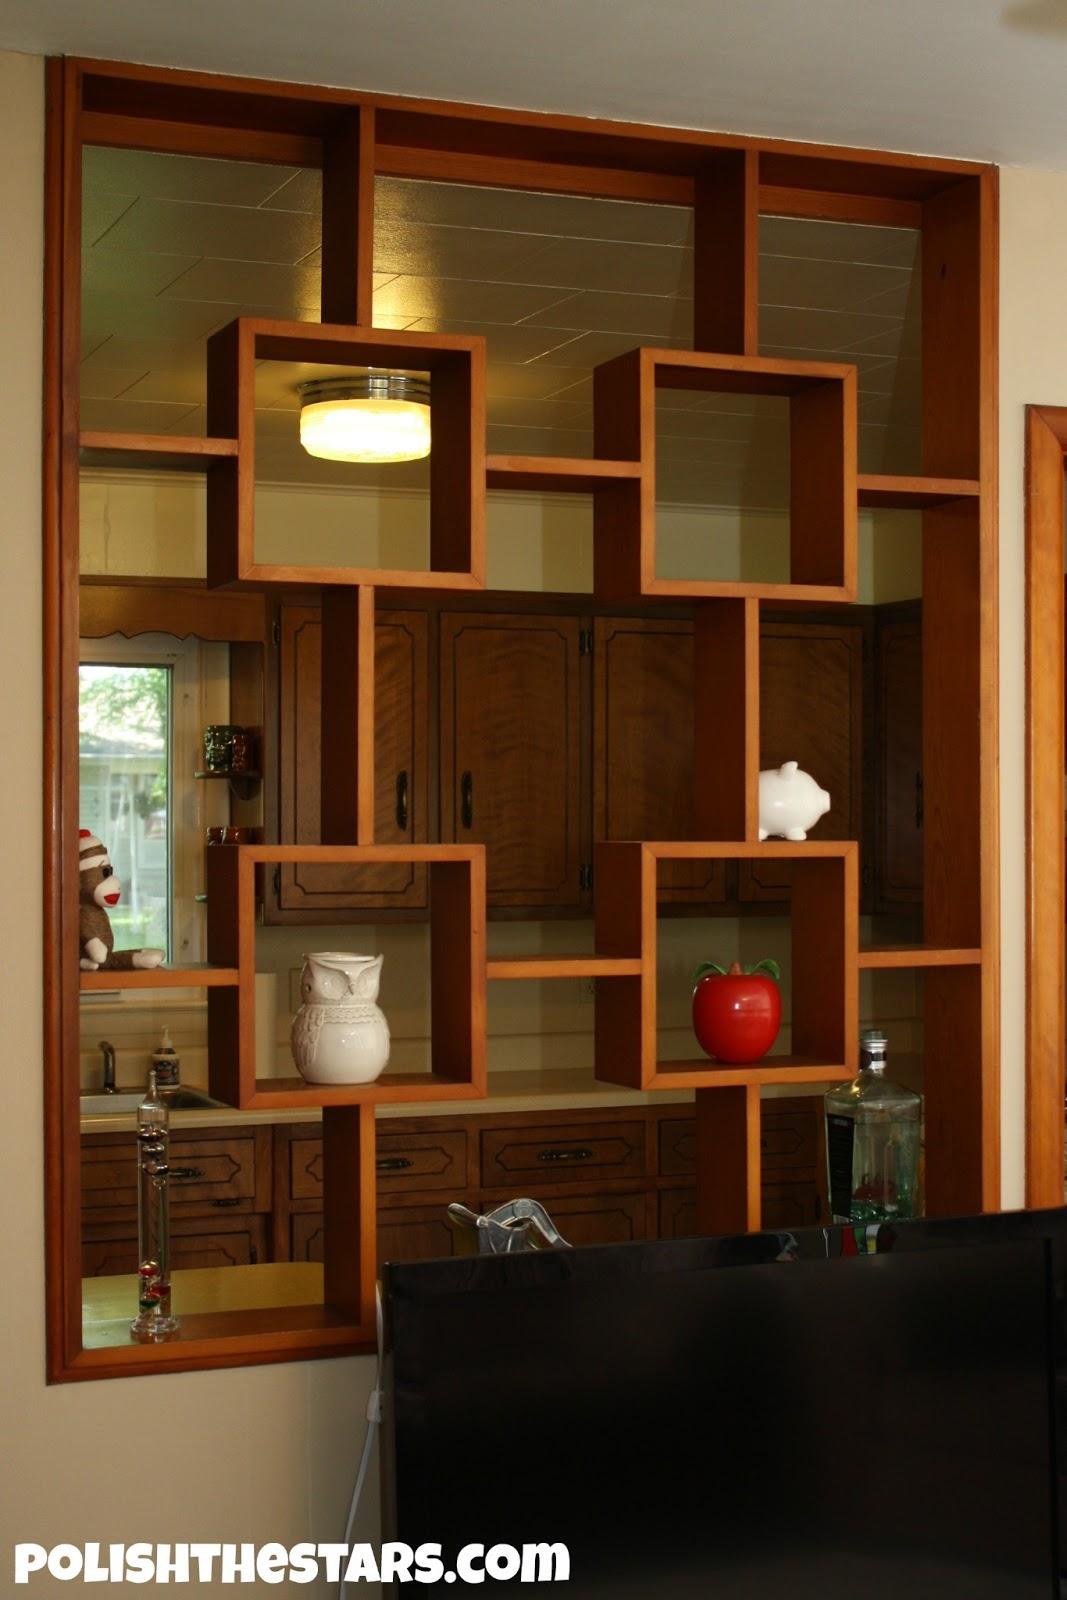 wall decor dividers photo - 3